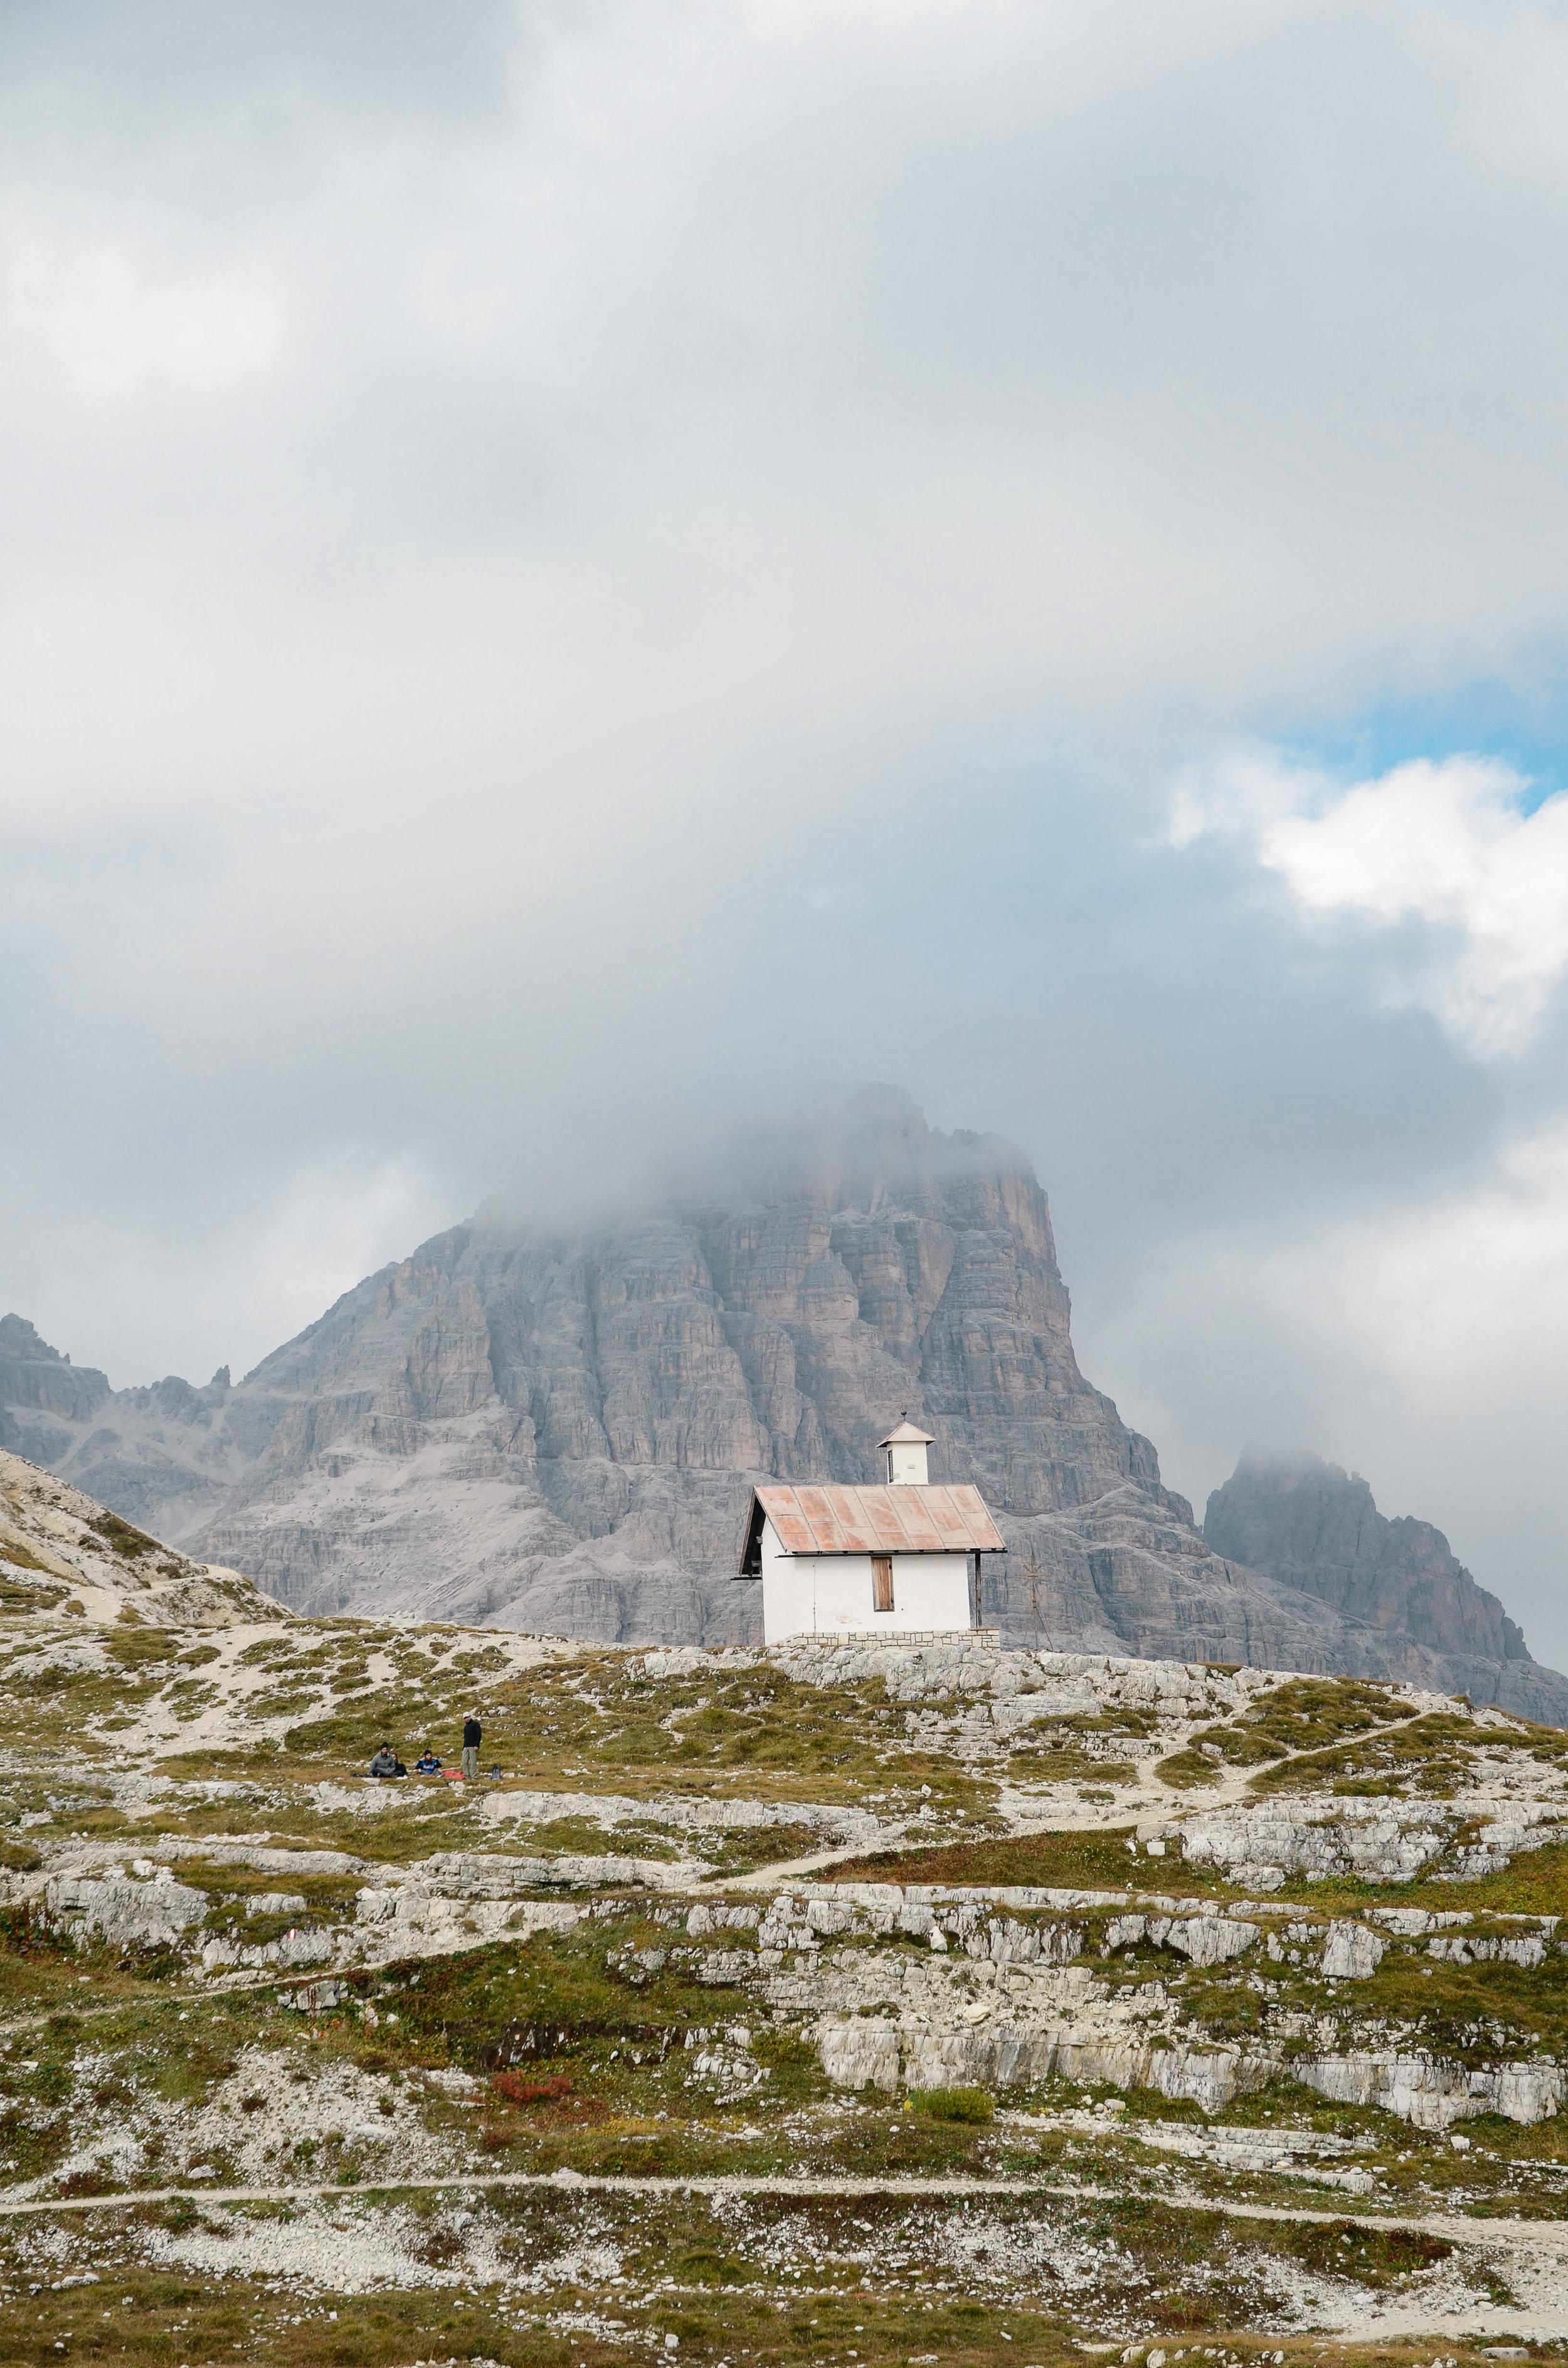 adventure-in-italy-3-hikes-dolomites-hiking-travel-blog-tyrol-14.jpg